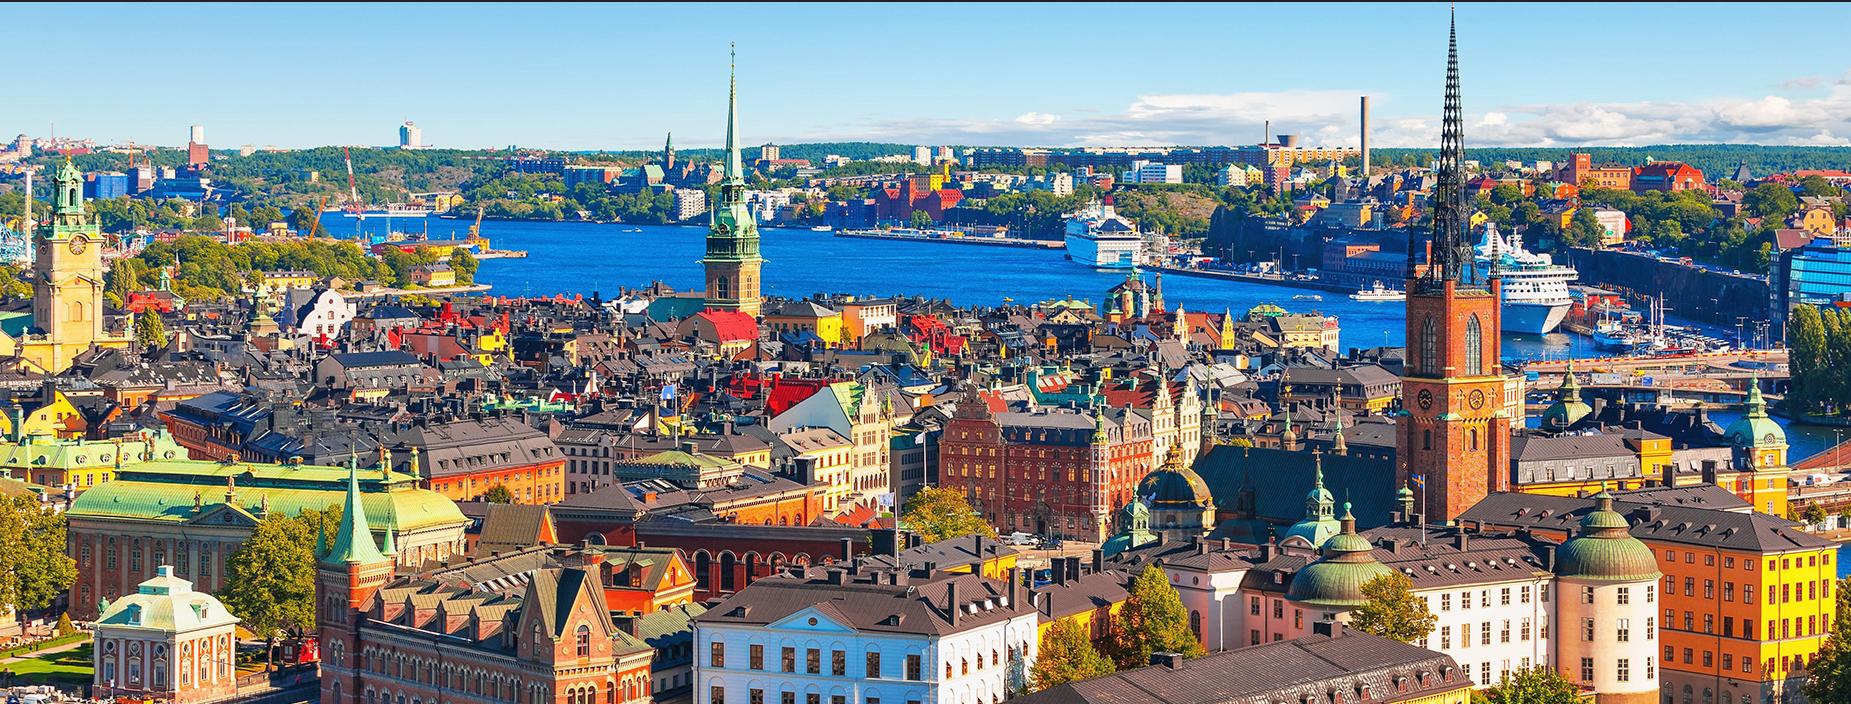 avio karte za Stokholm